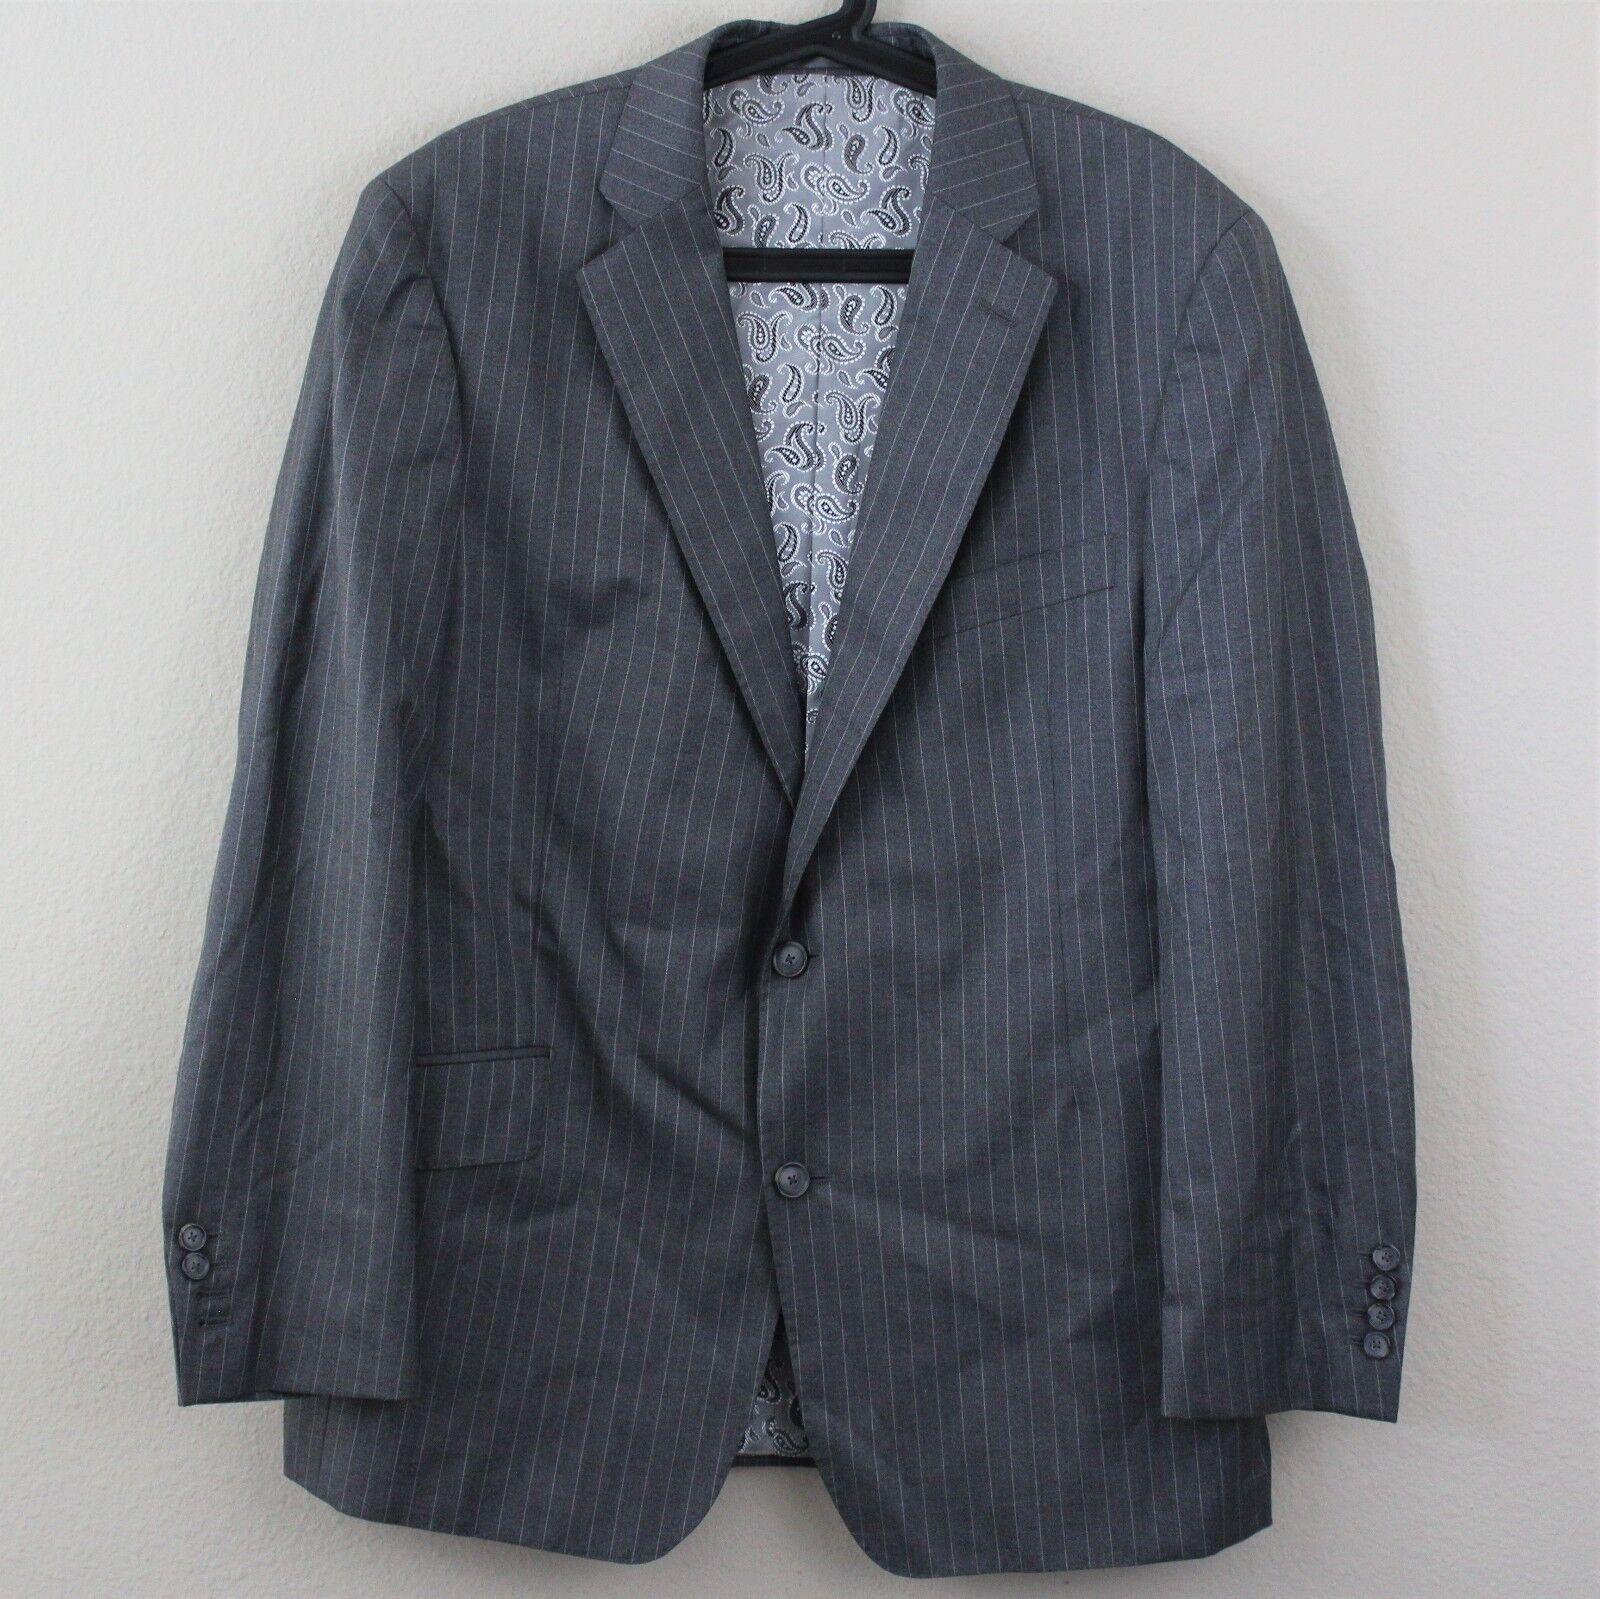 40 SAVILE ROW x LORO PIANA Sakko Pinstripe 2 Button Suit Blazer  Herren 54 B238